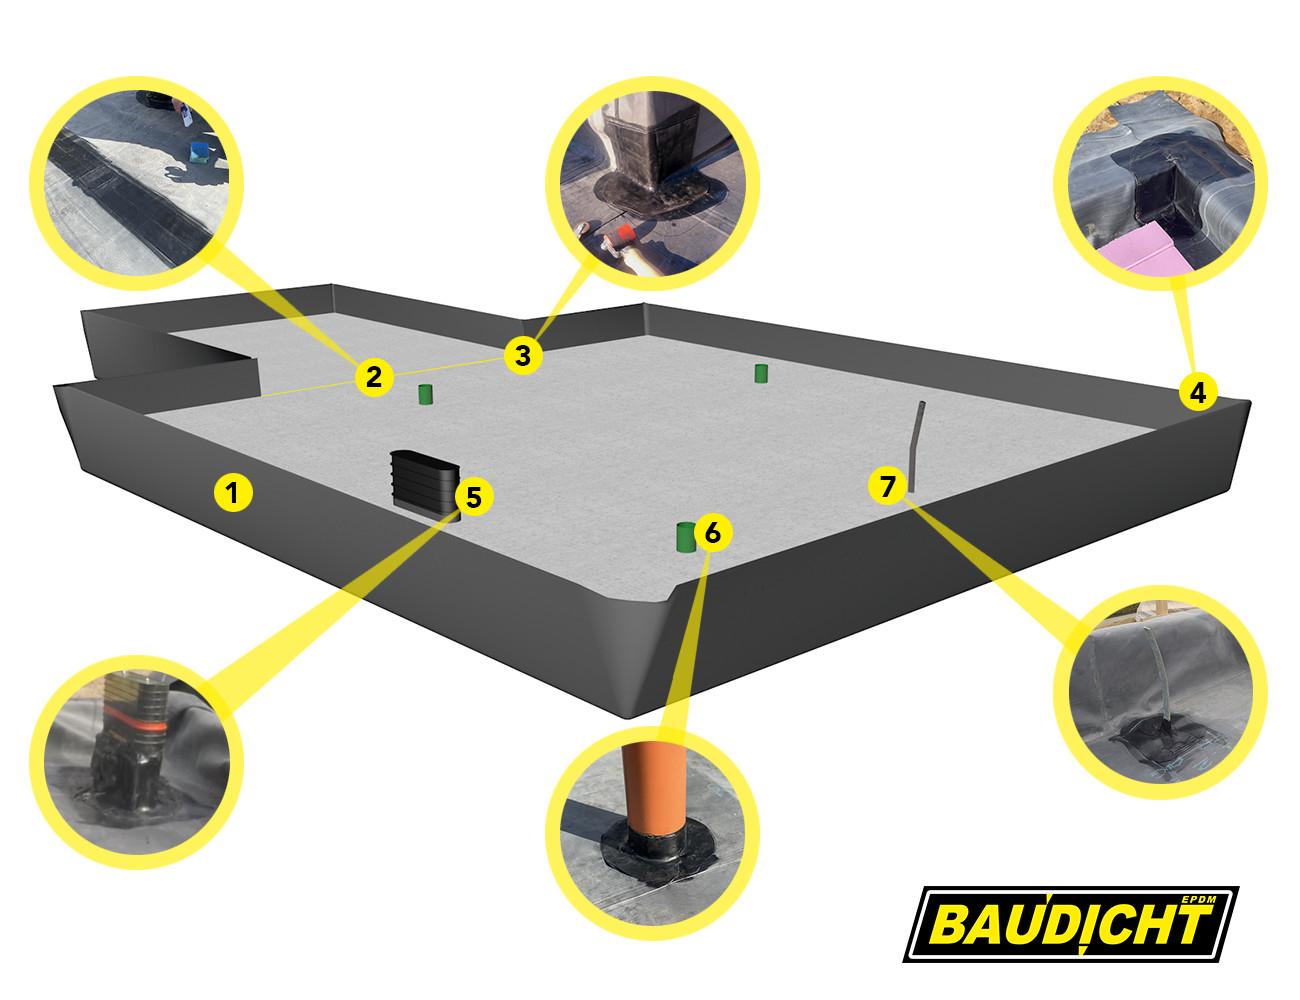 BAUDICHT EPDM Bauwerksabdichtung Illustration Sohle Checkliste